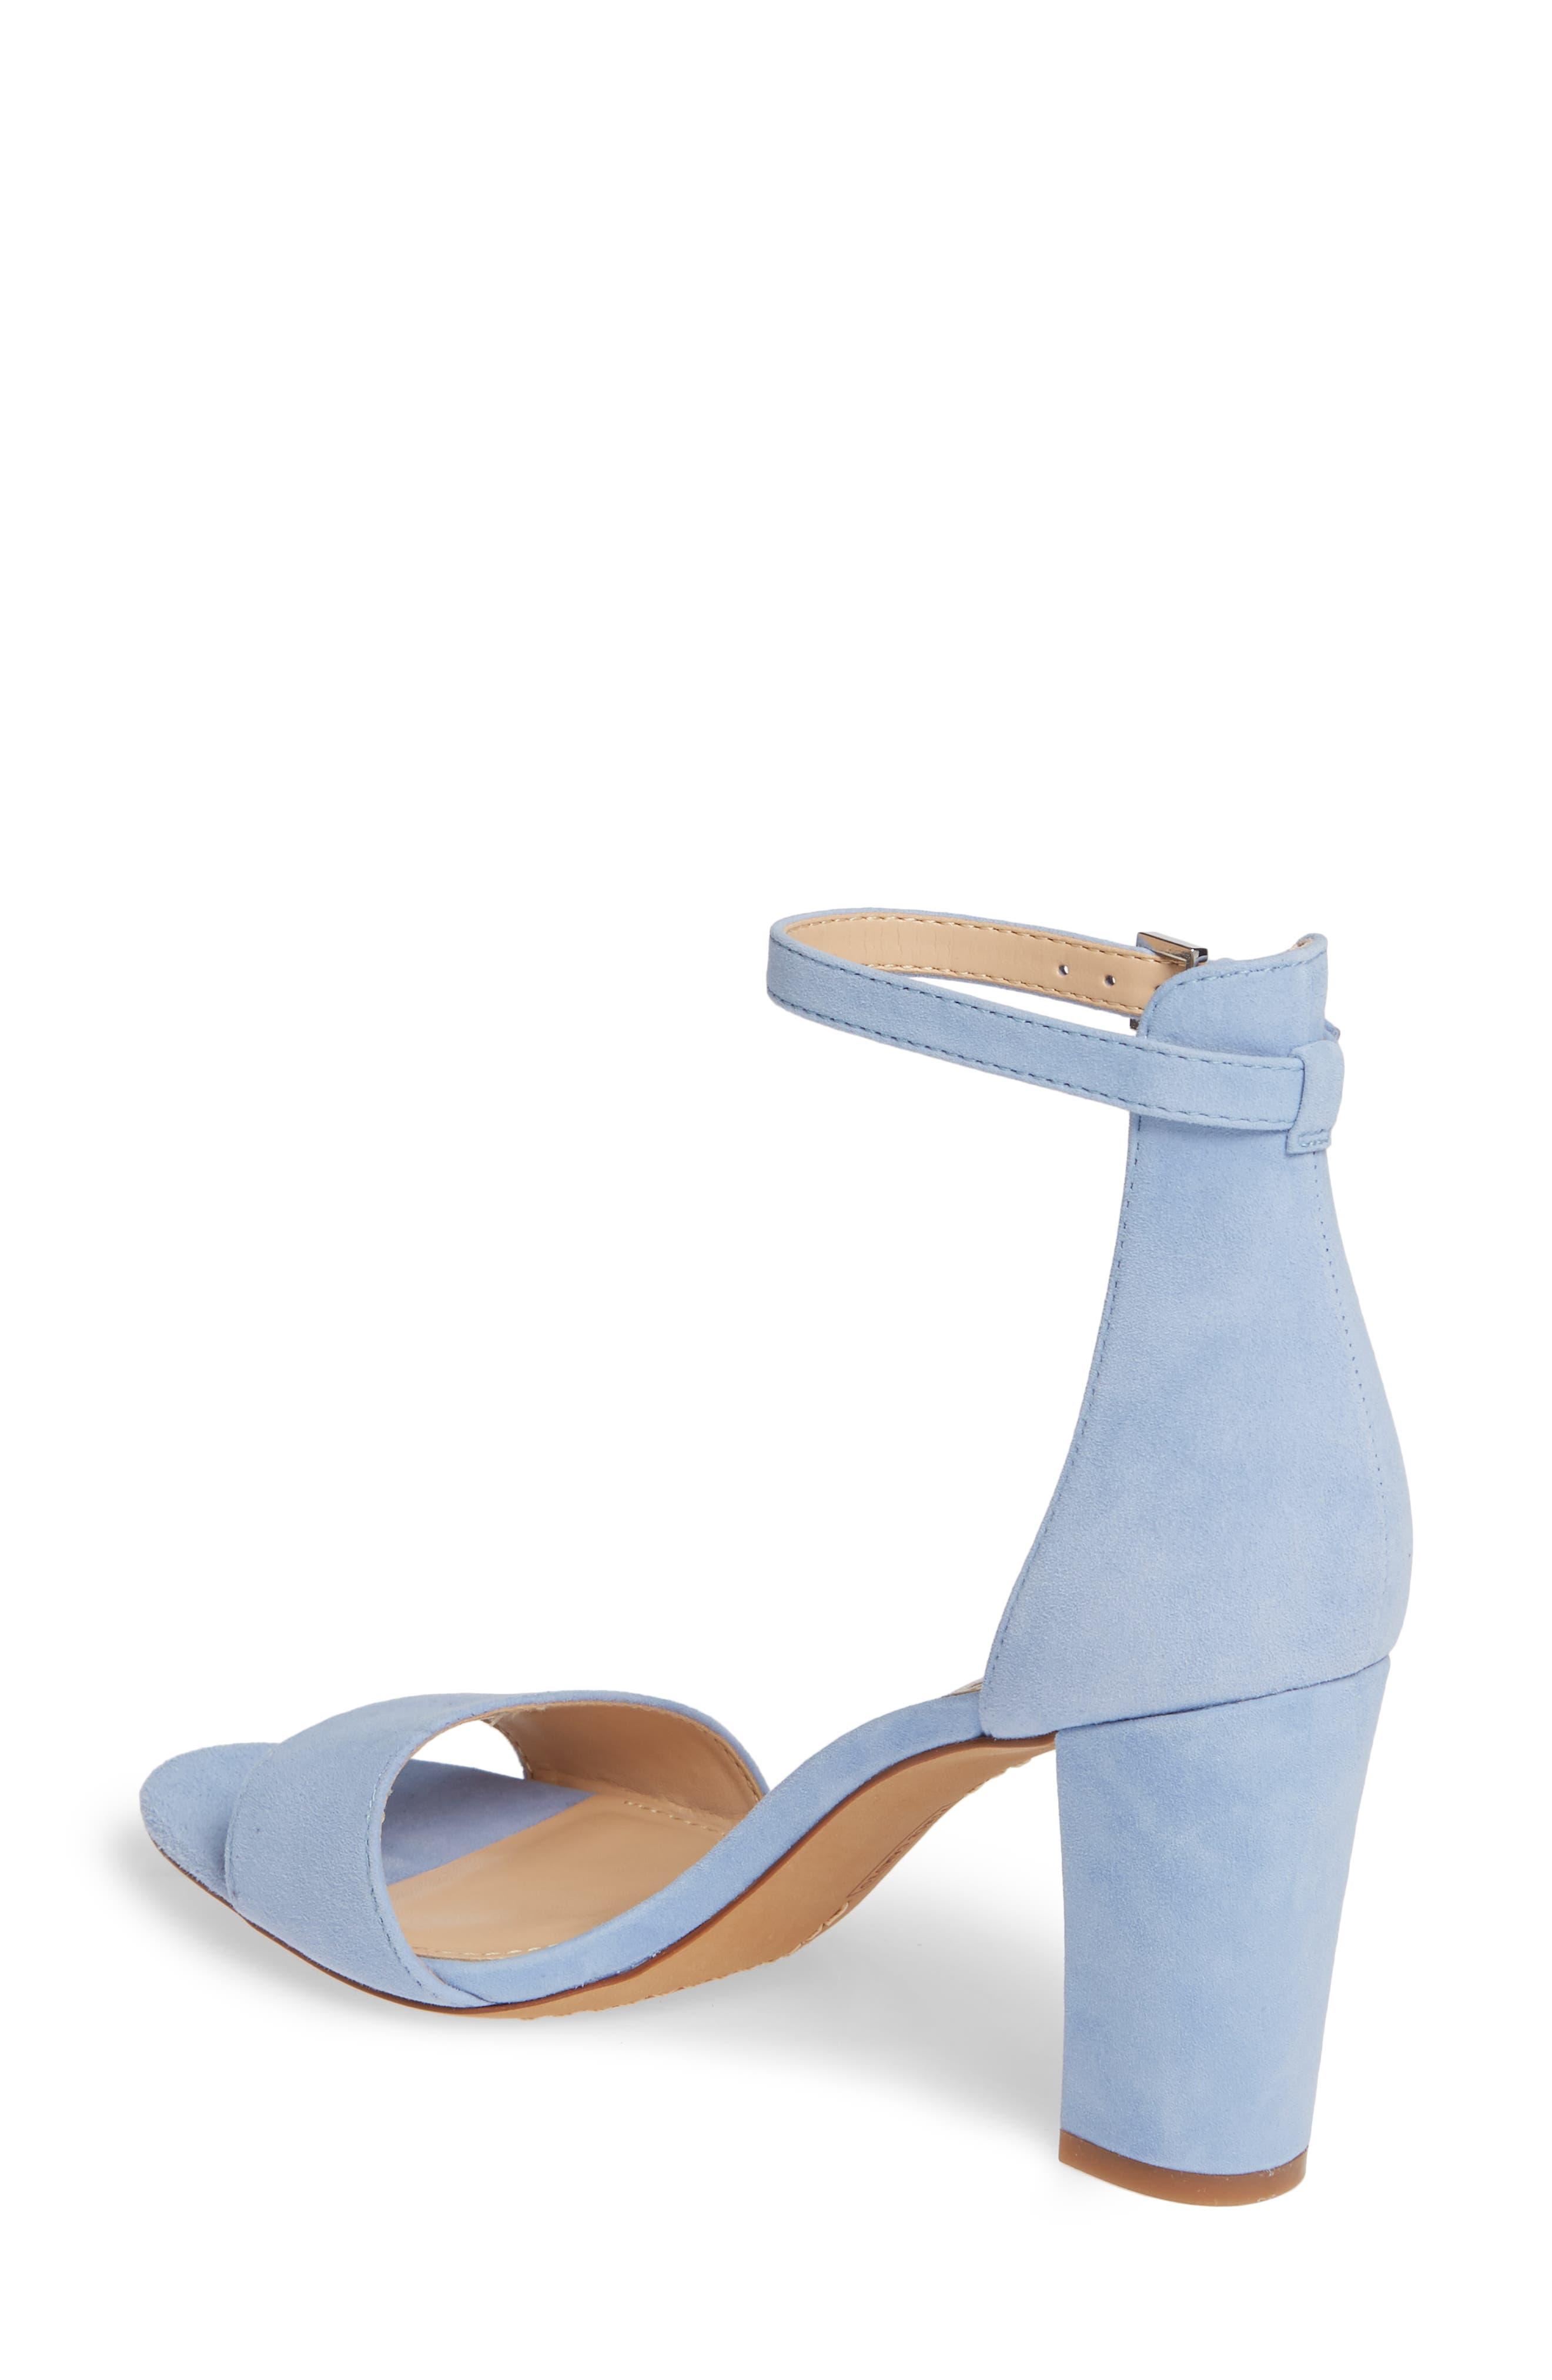 3efffd15bc55 Blue Block-Heel Sandals for Women